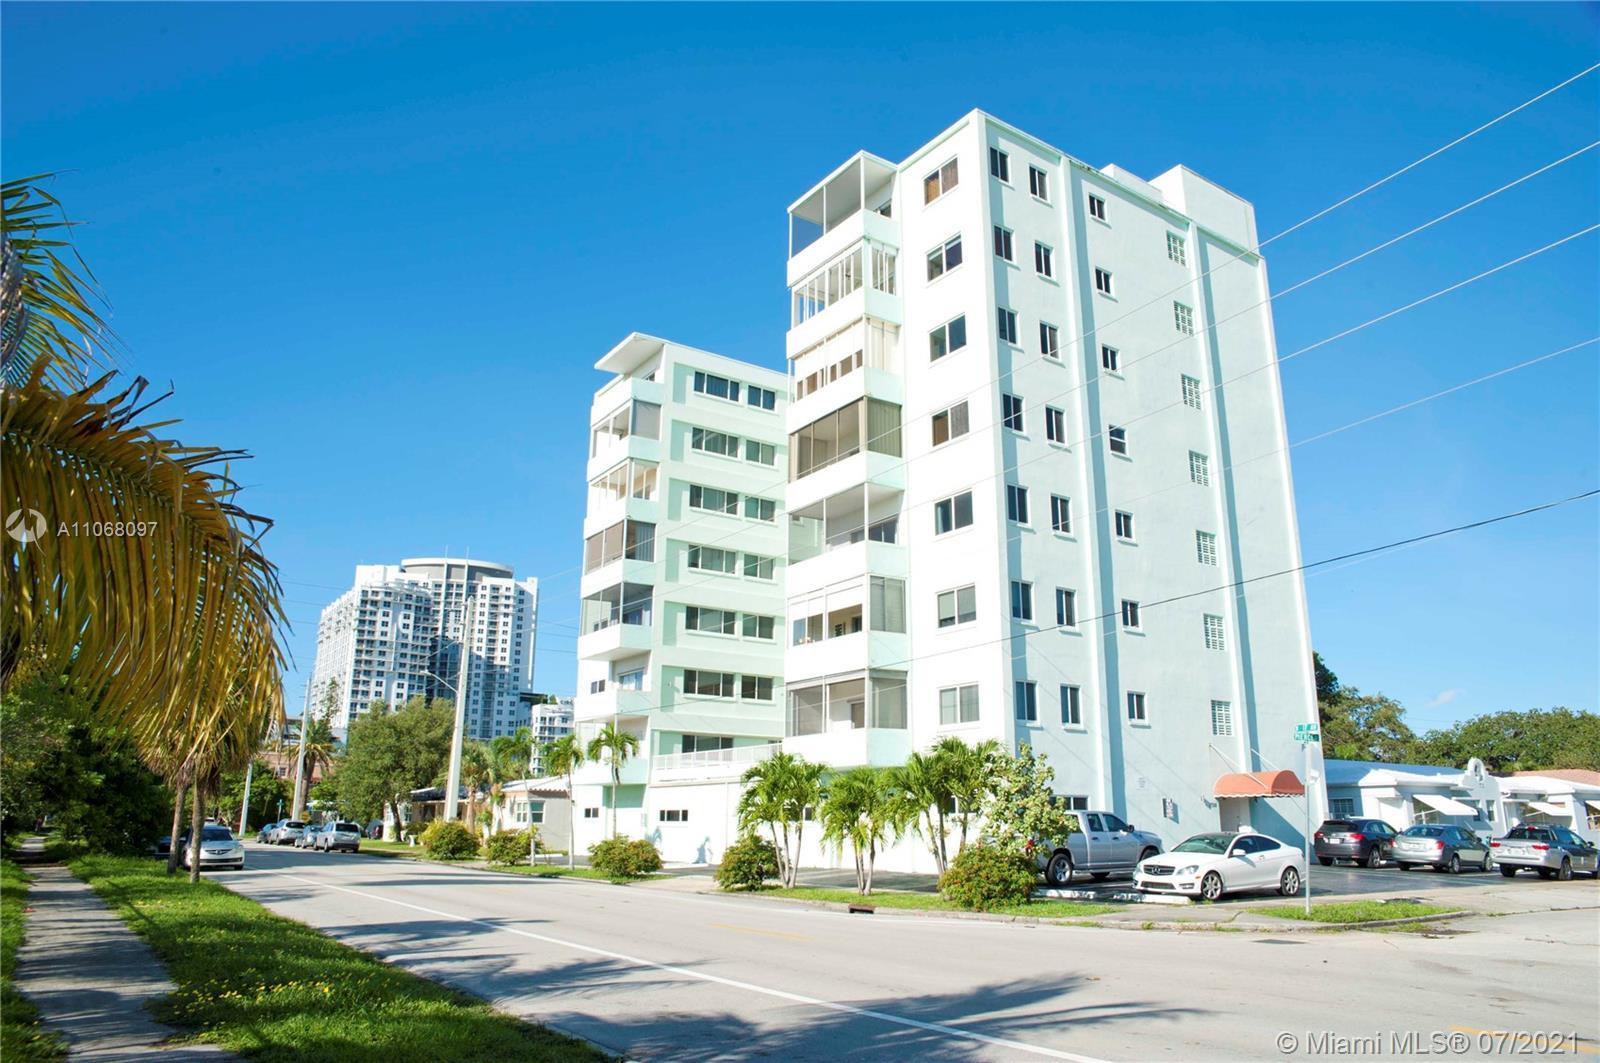 1700 E Pierce St Unit 703, Hollywood, Florida 33020